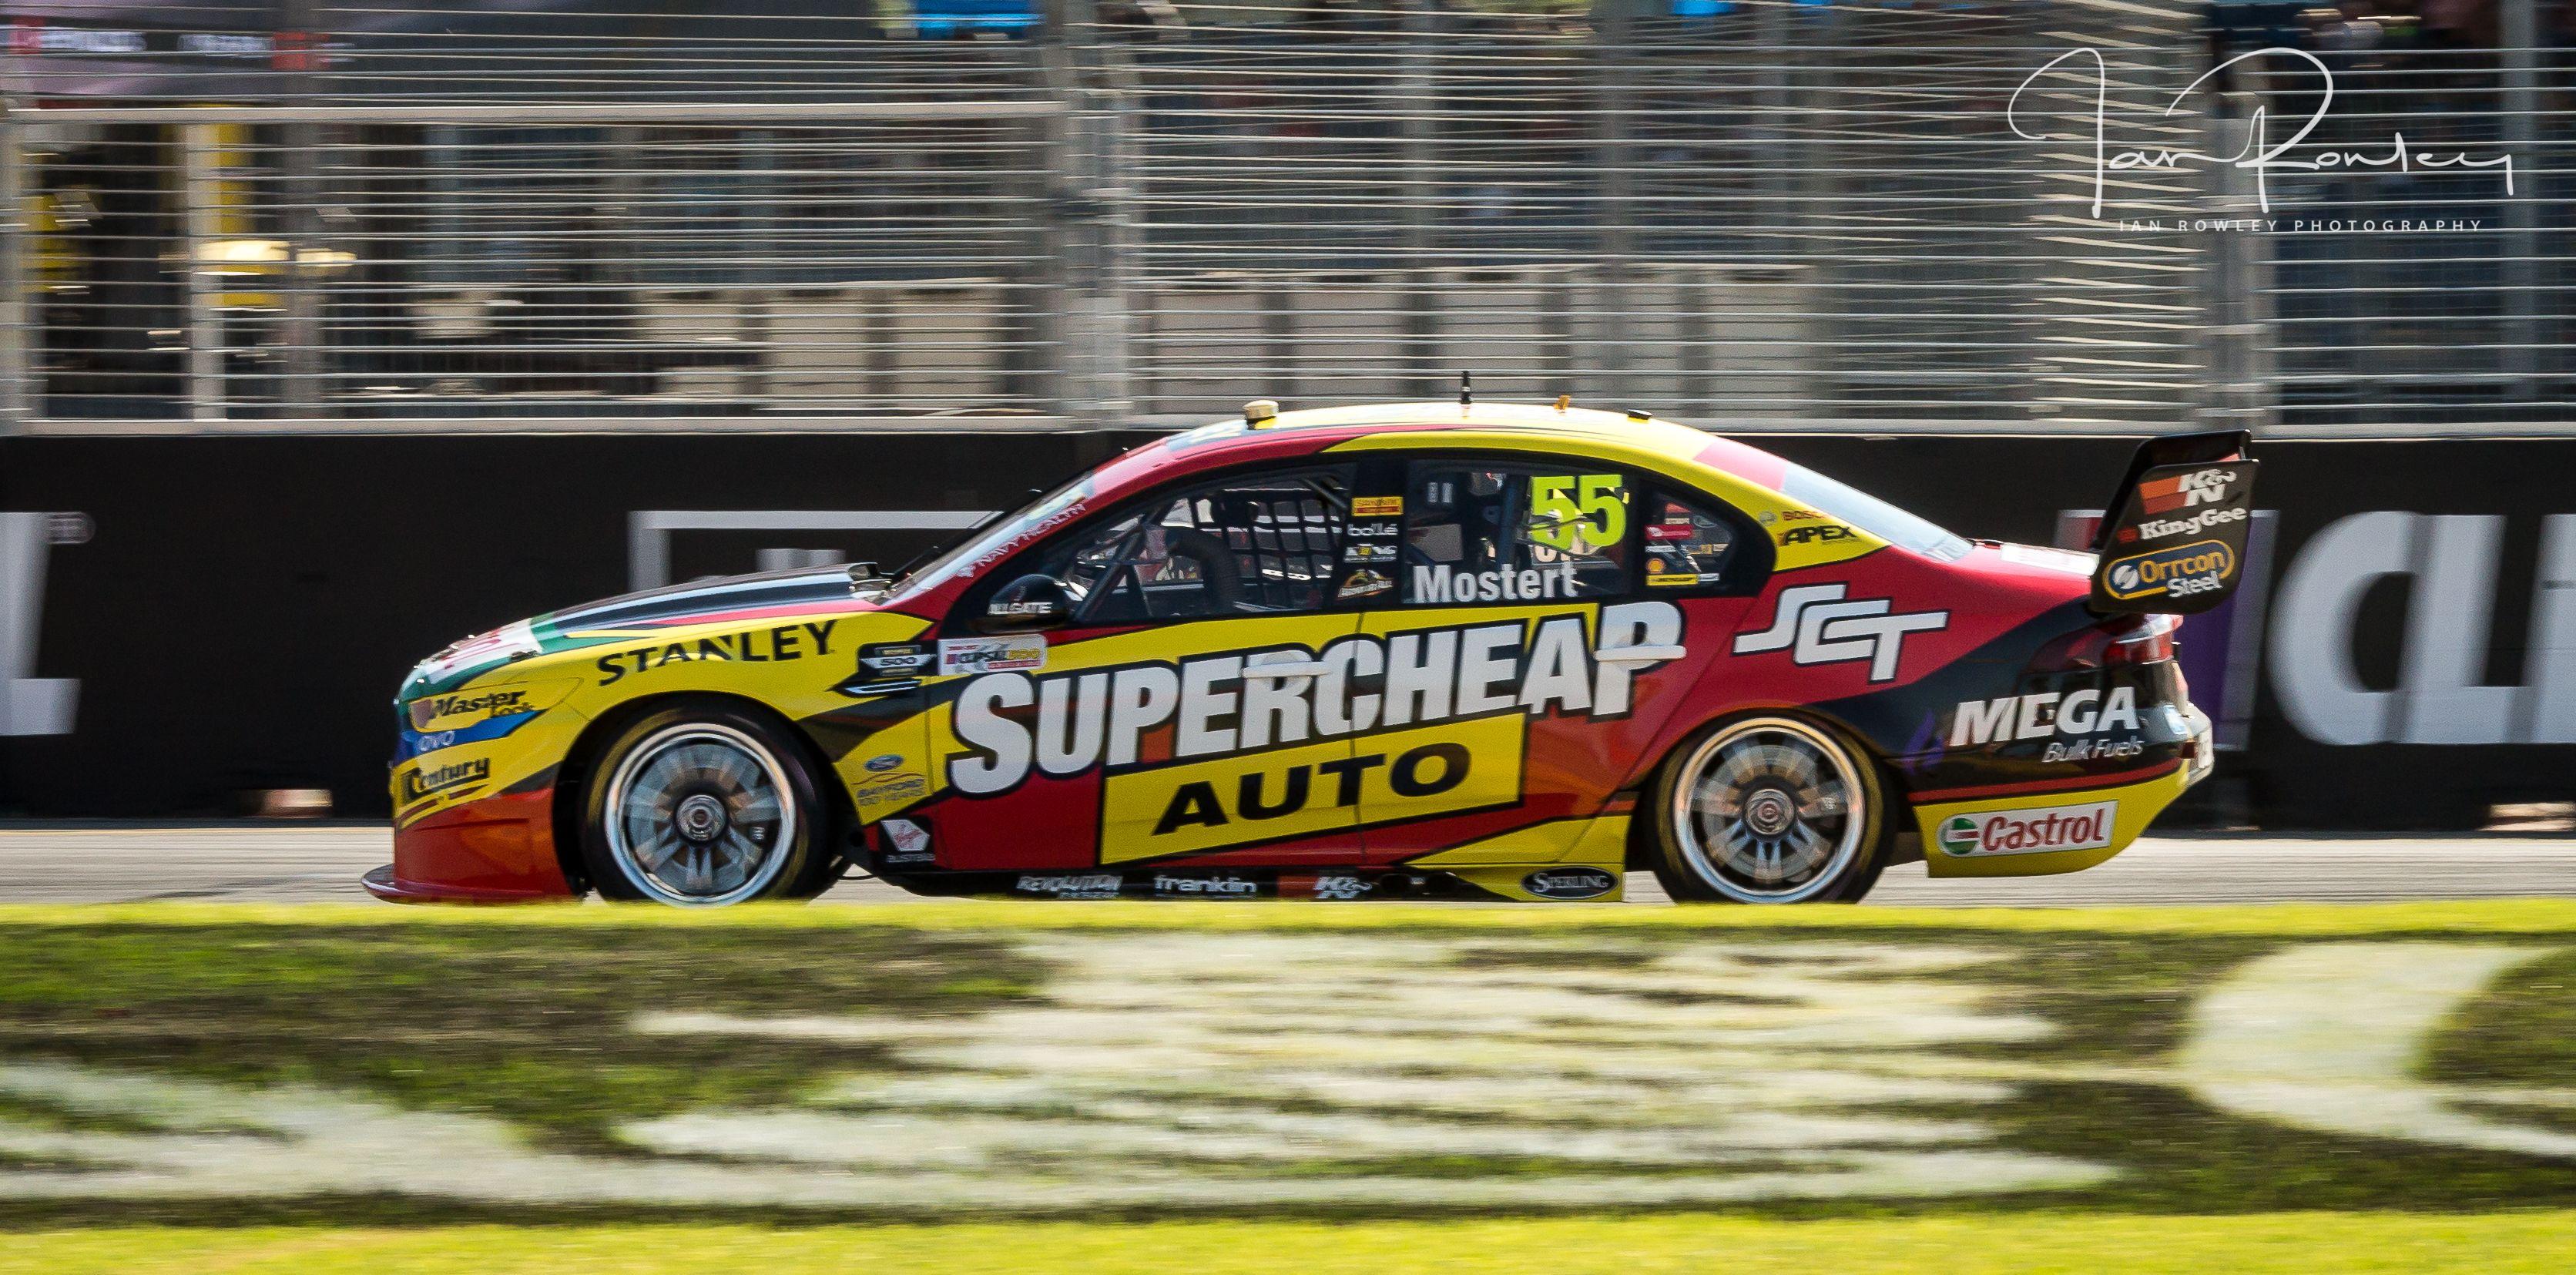 Chaz Mostert Supercheap Auto Racing Clipsal 500 2017 Australian V8 Supercars V8 Supercars Racing